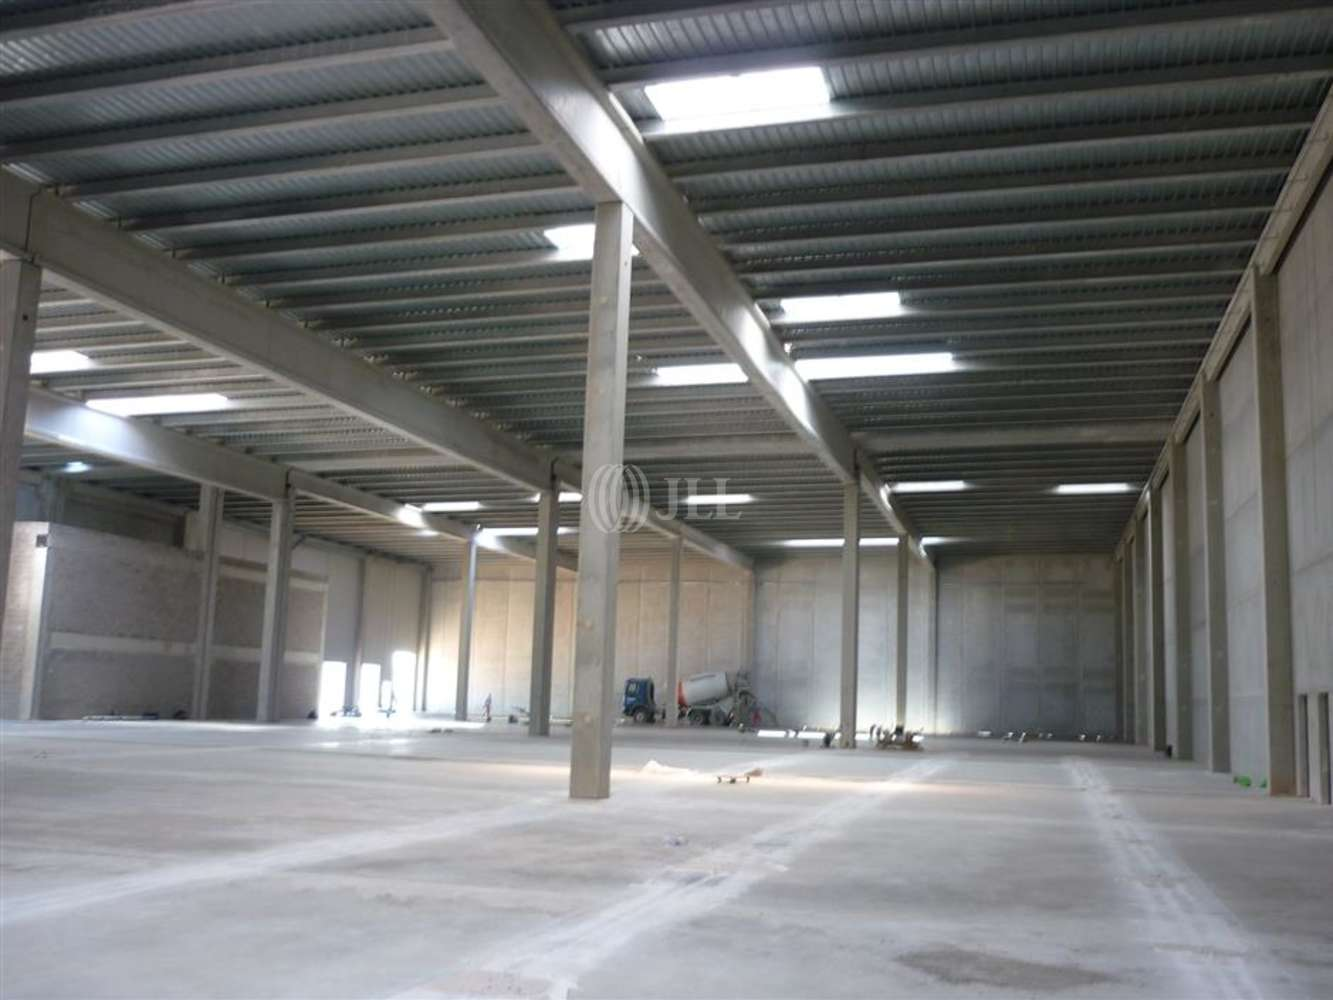 Naves industriales y logísticas Barcelona, 08040 - Nave Logistica - B0270 - PI BZ